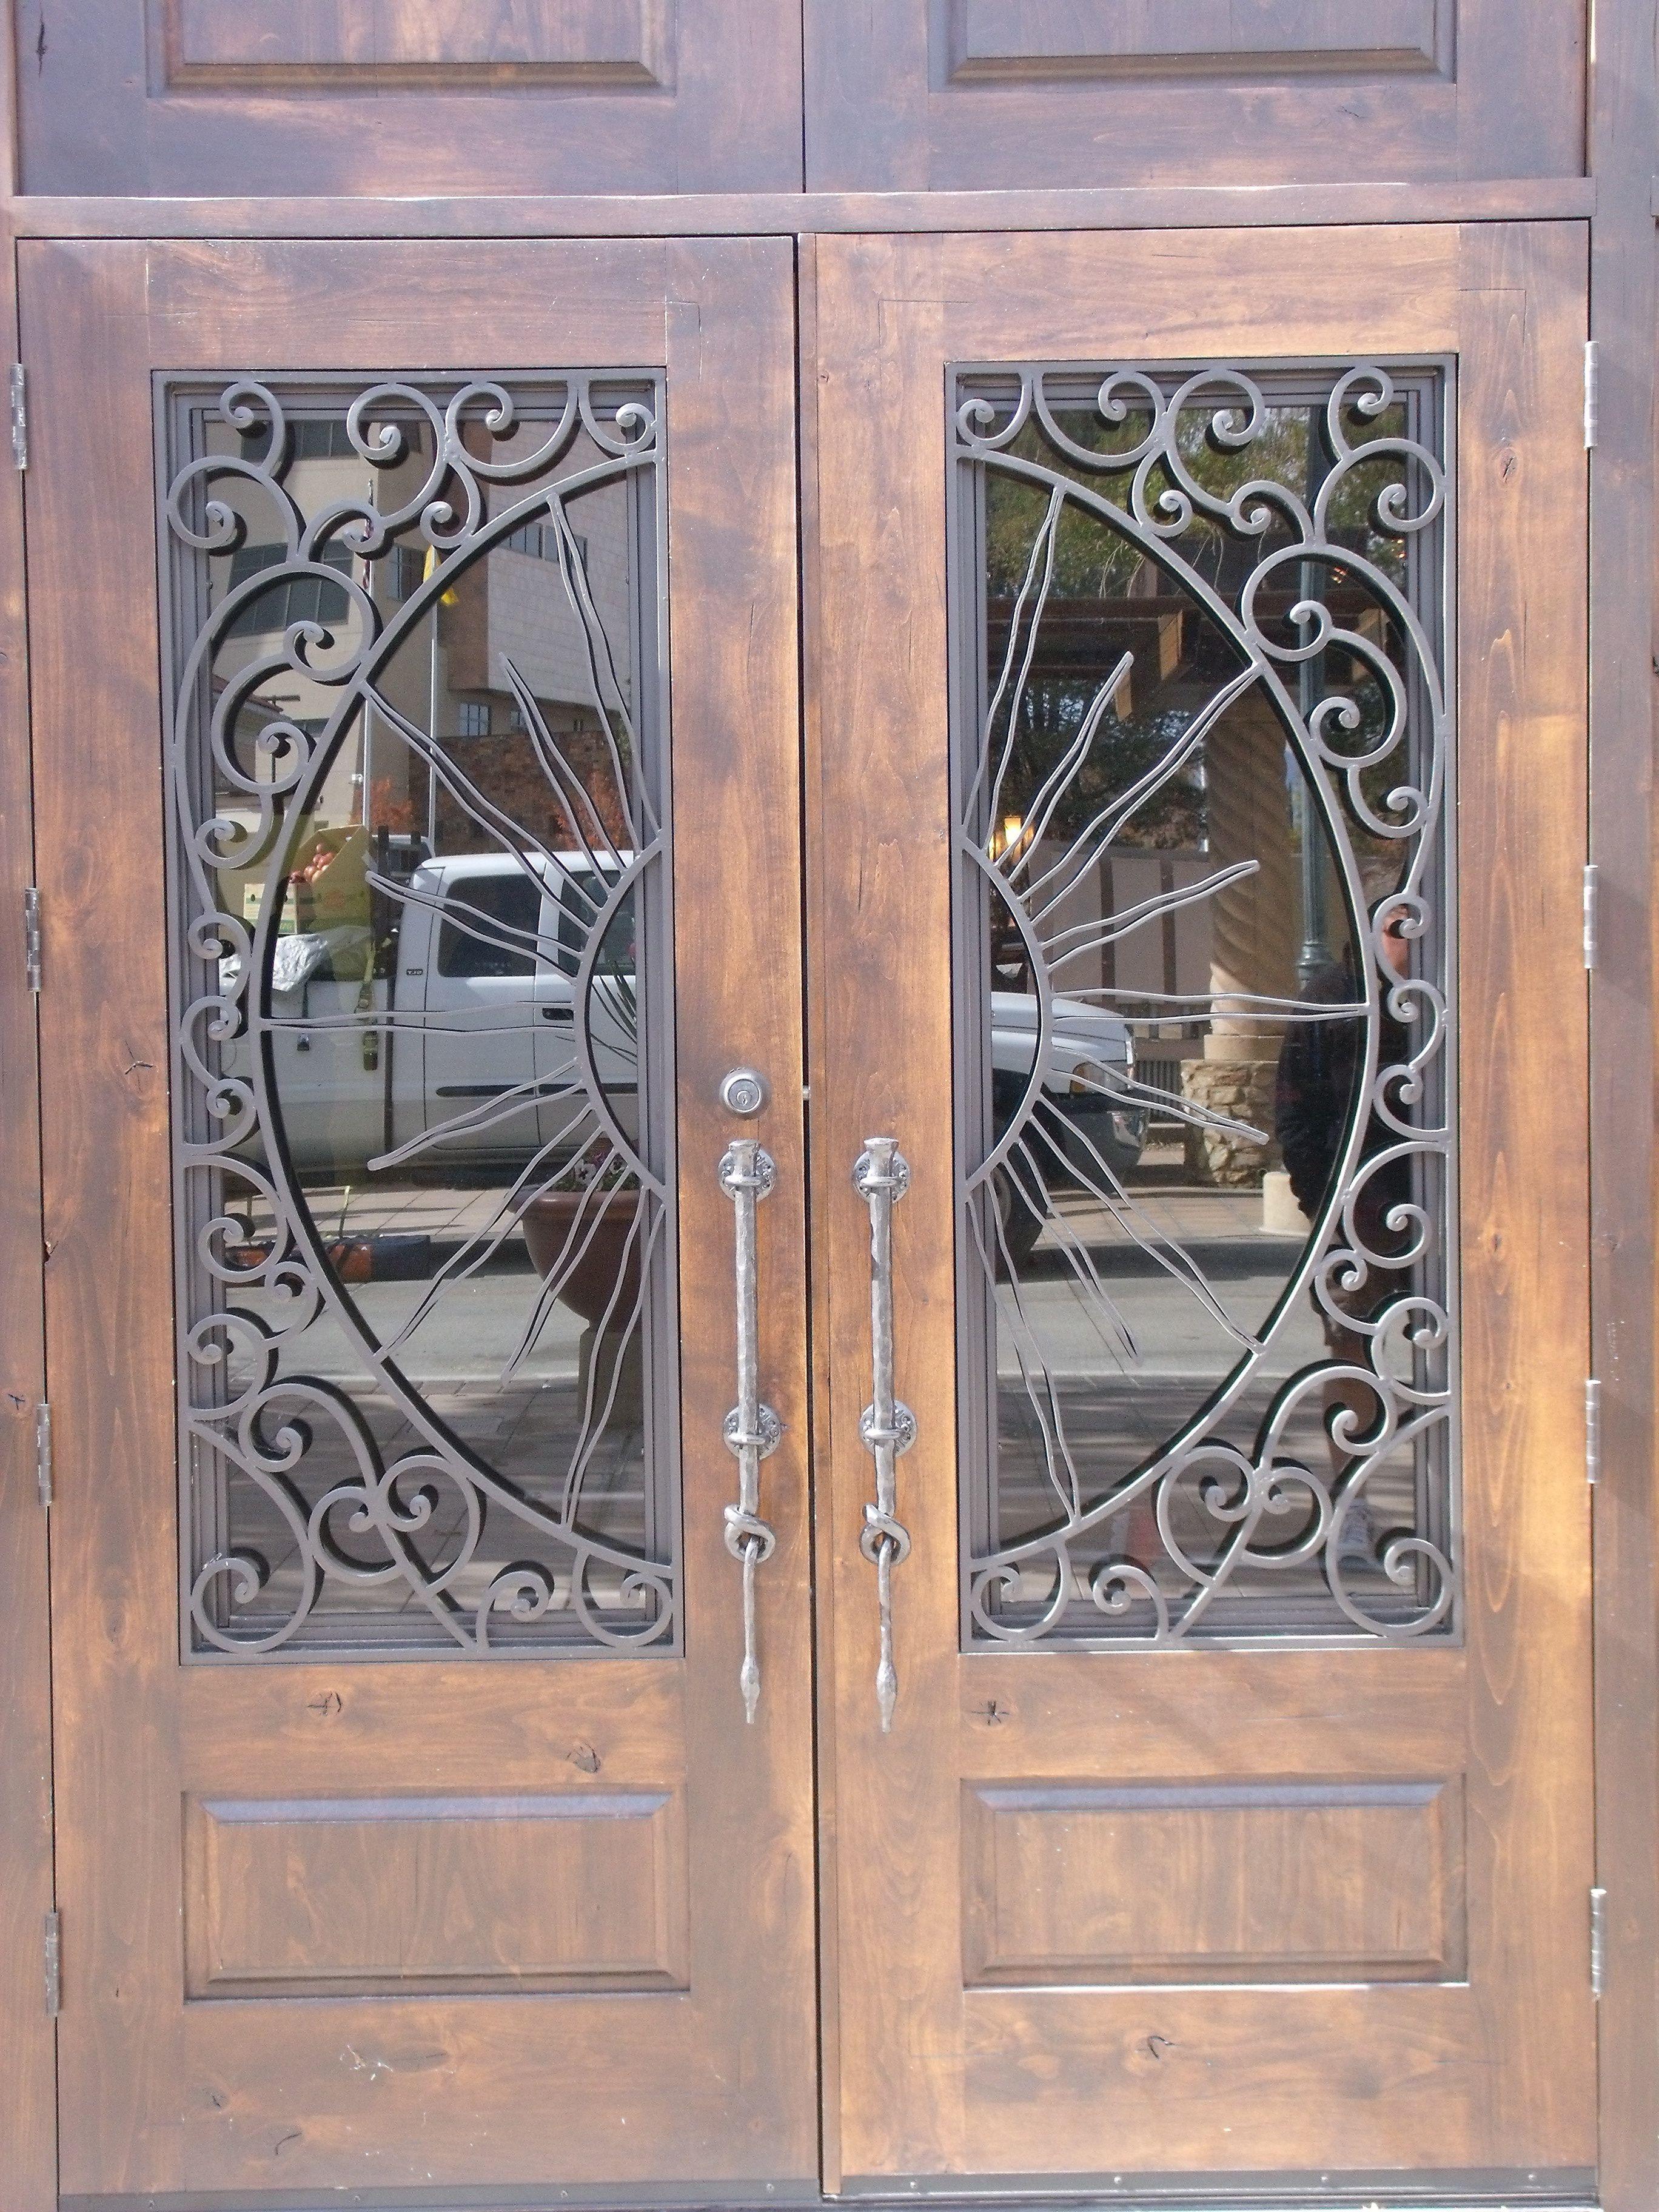 Related pictures rejas para casa decoracion dise portones for Decoracion de fachadas de casas